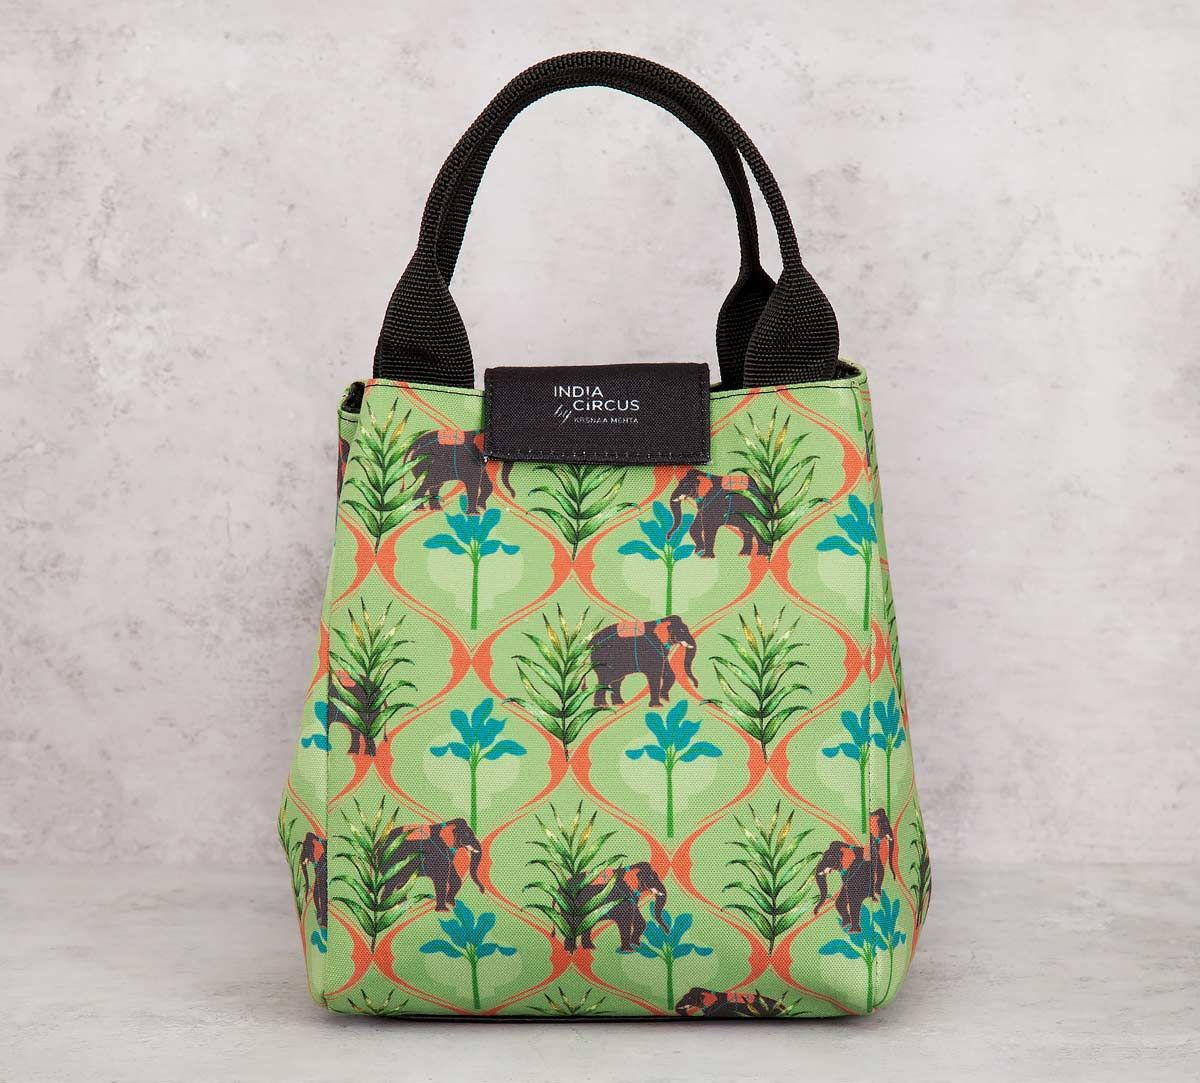 India Circus Jungle Safari Lunch Bag